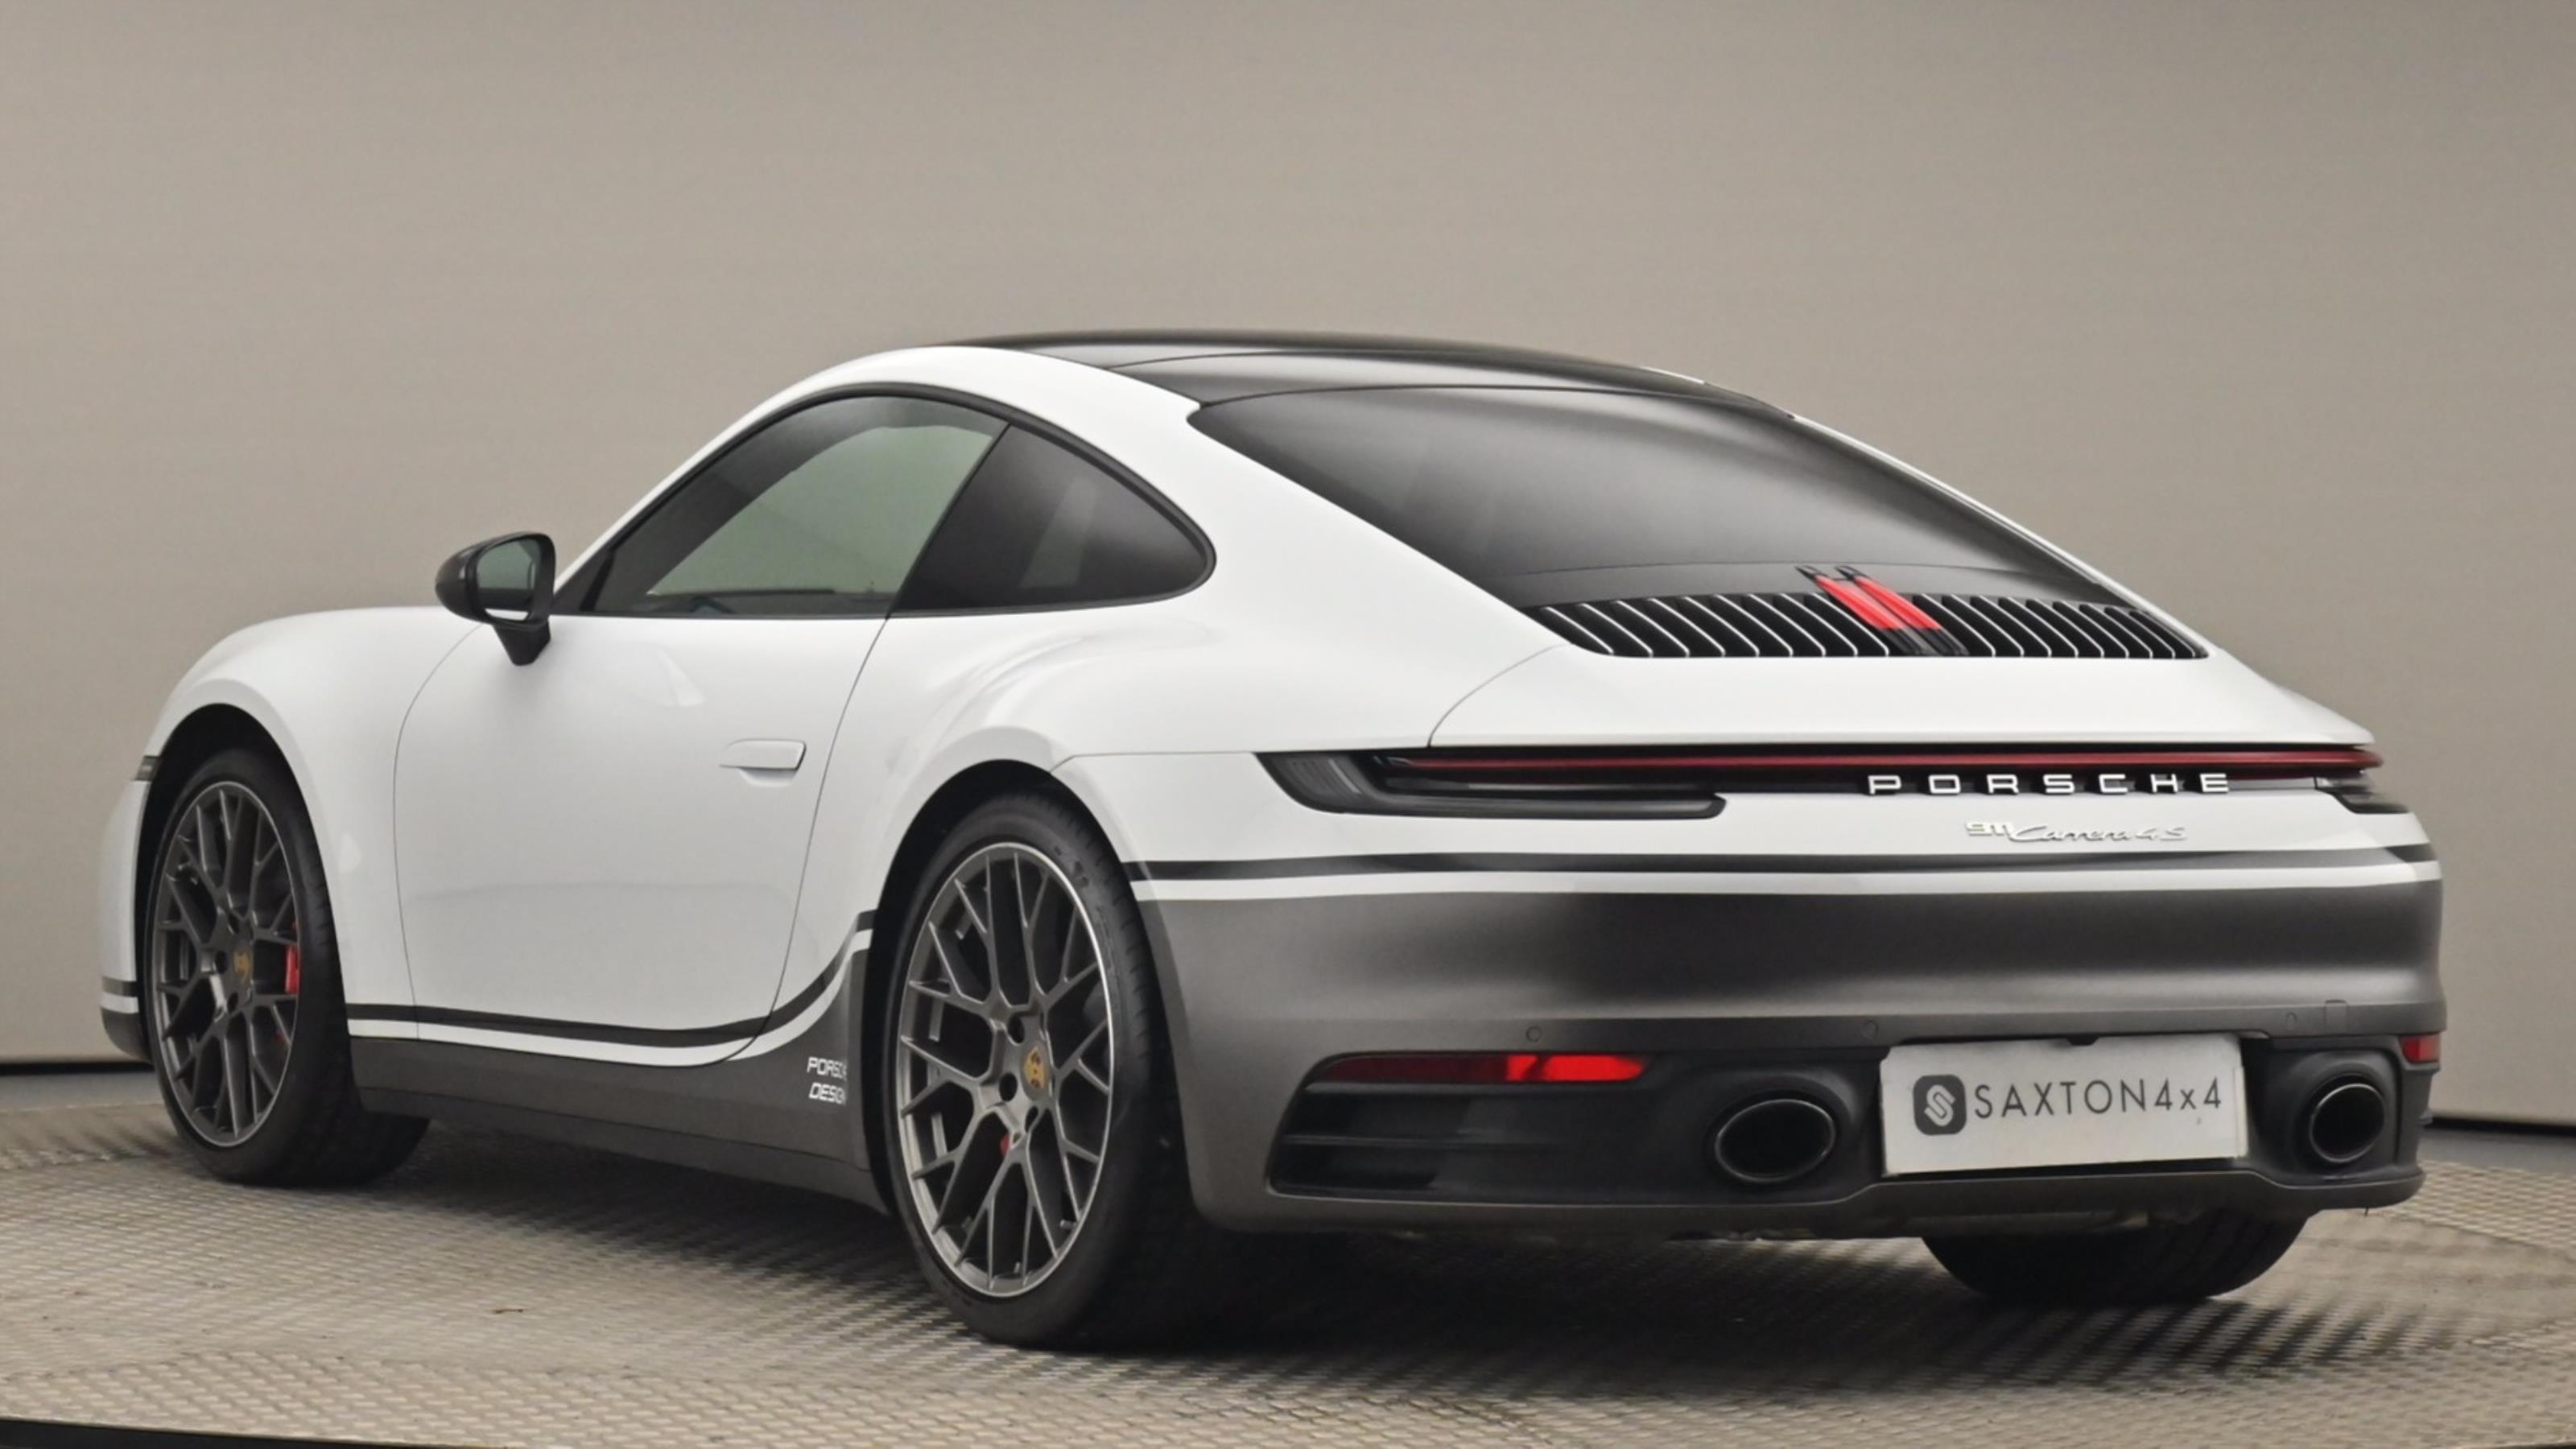 Used 2019 Porsche 911 S 2dr PDK WHITE at Saxton4x4